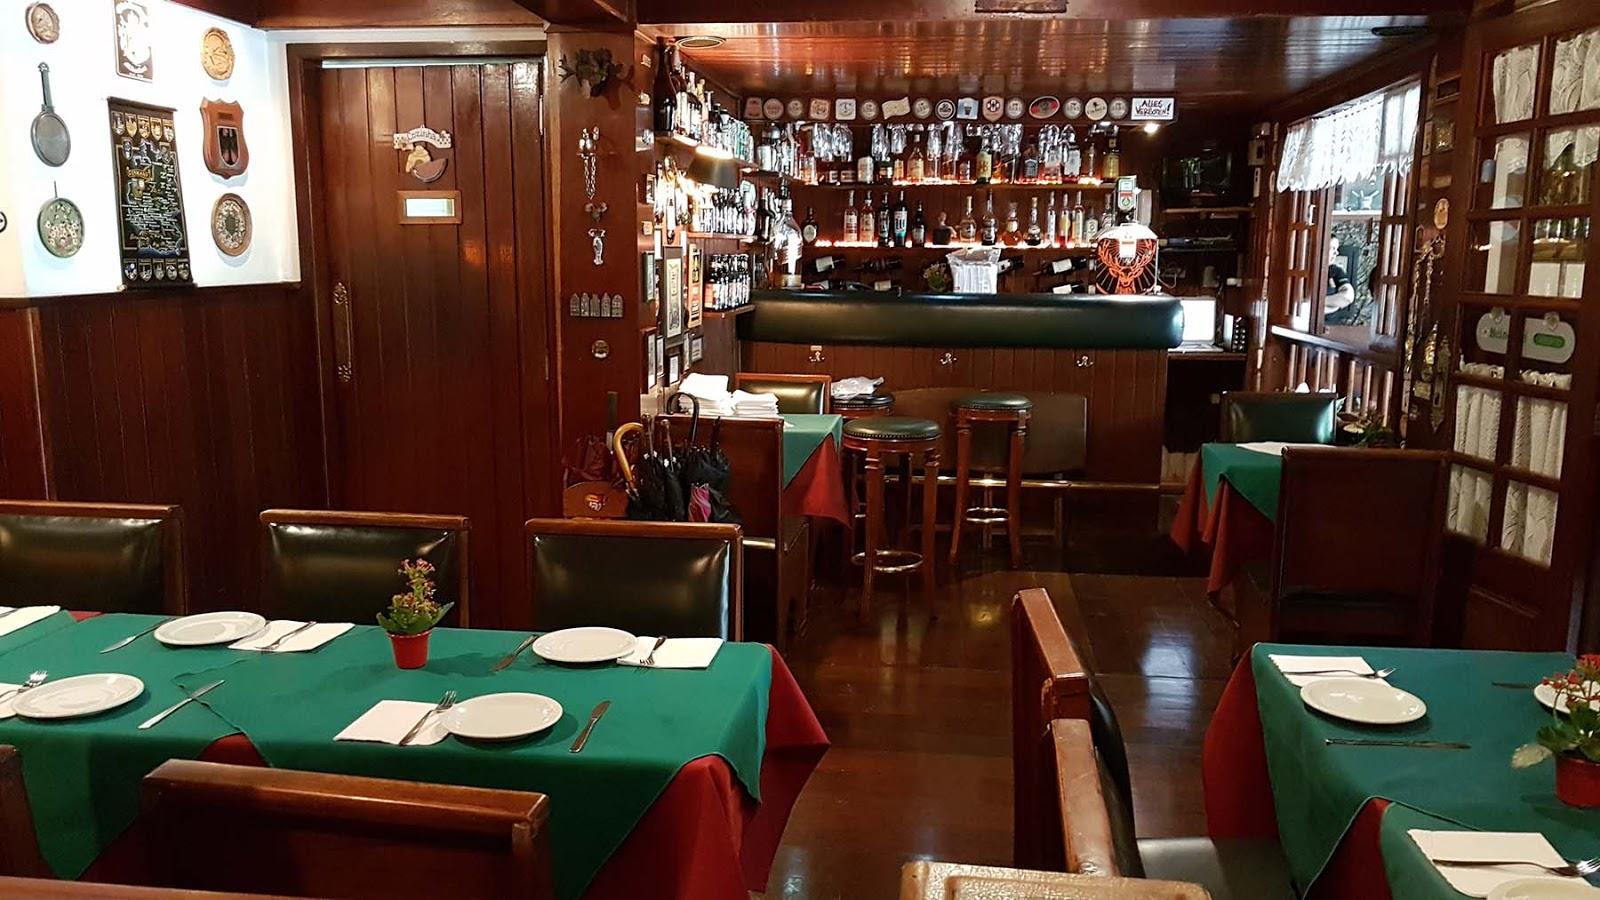 Restaurante Bräun & Bräun, Mury,RJ